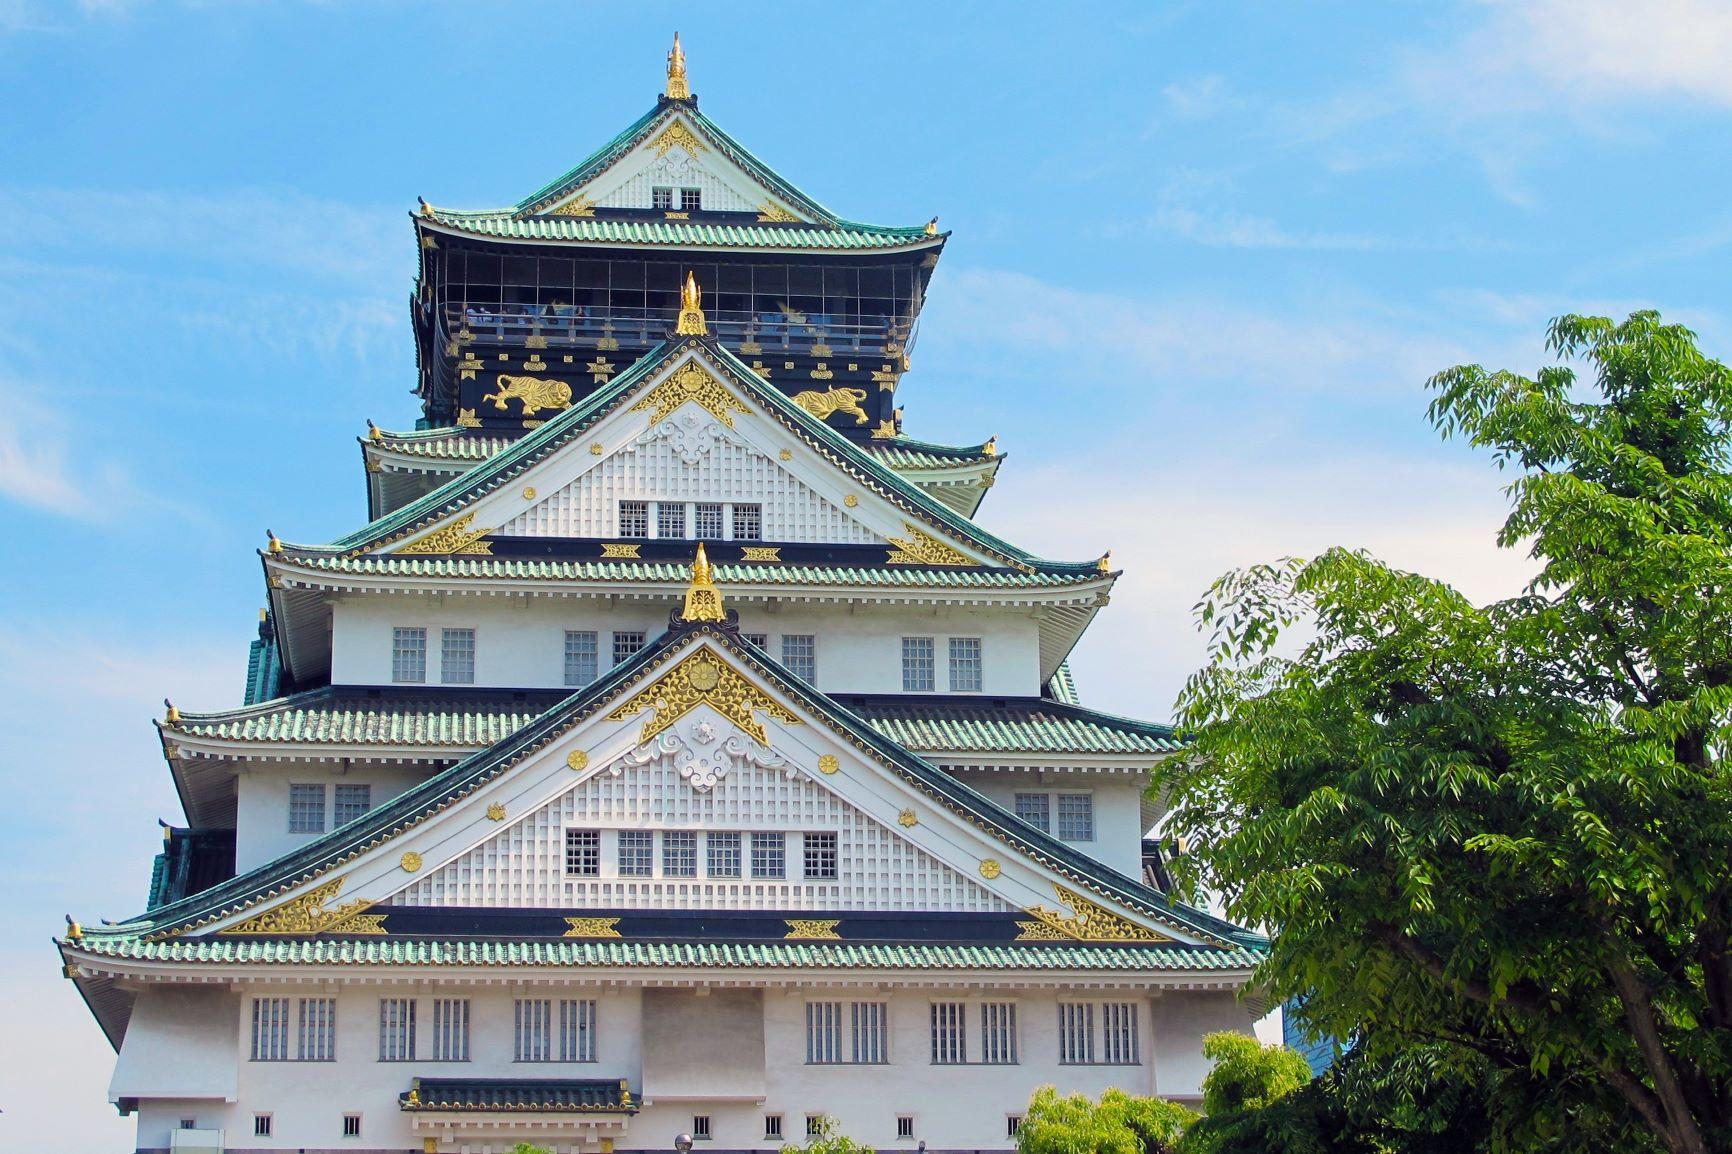 Geishas y samurais. Japón. NUBA everywhere. Castillo Osaka